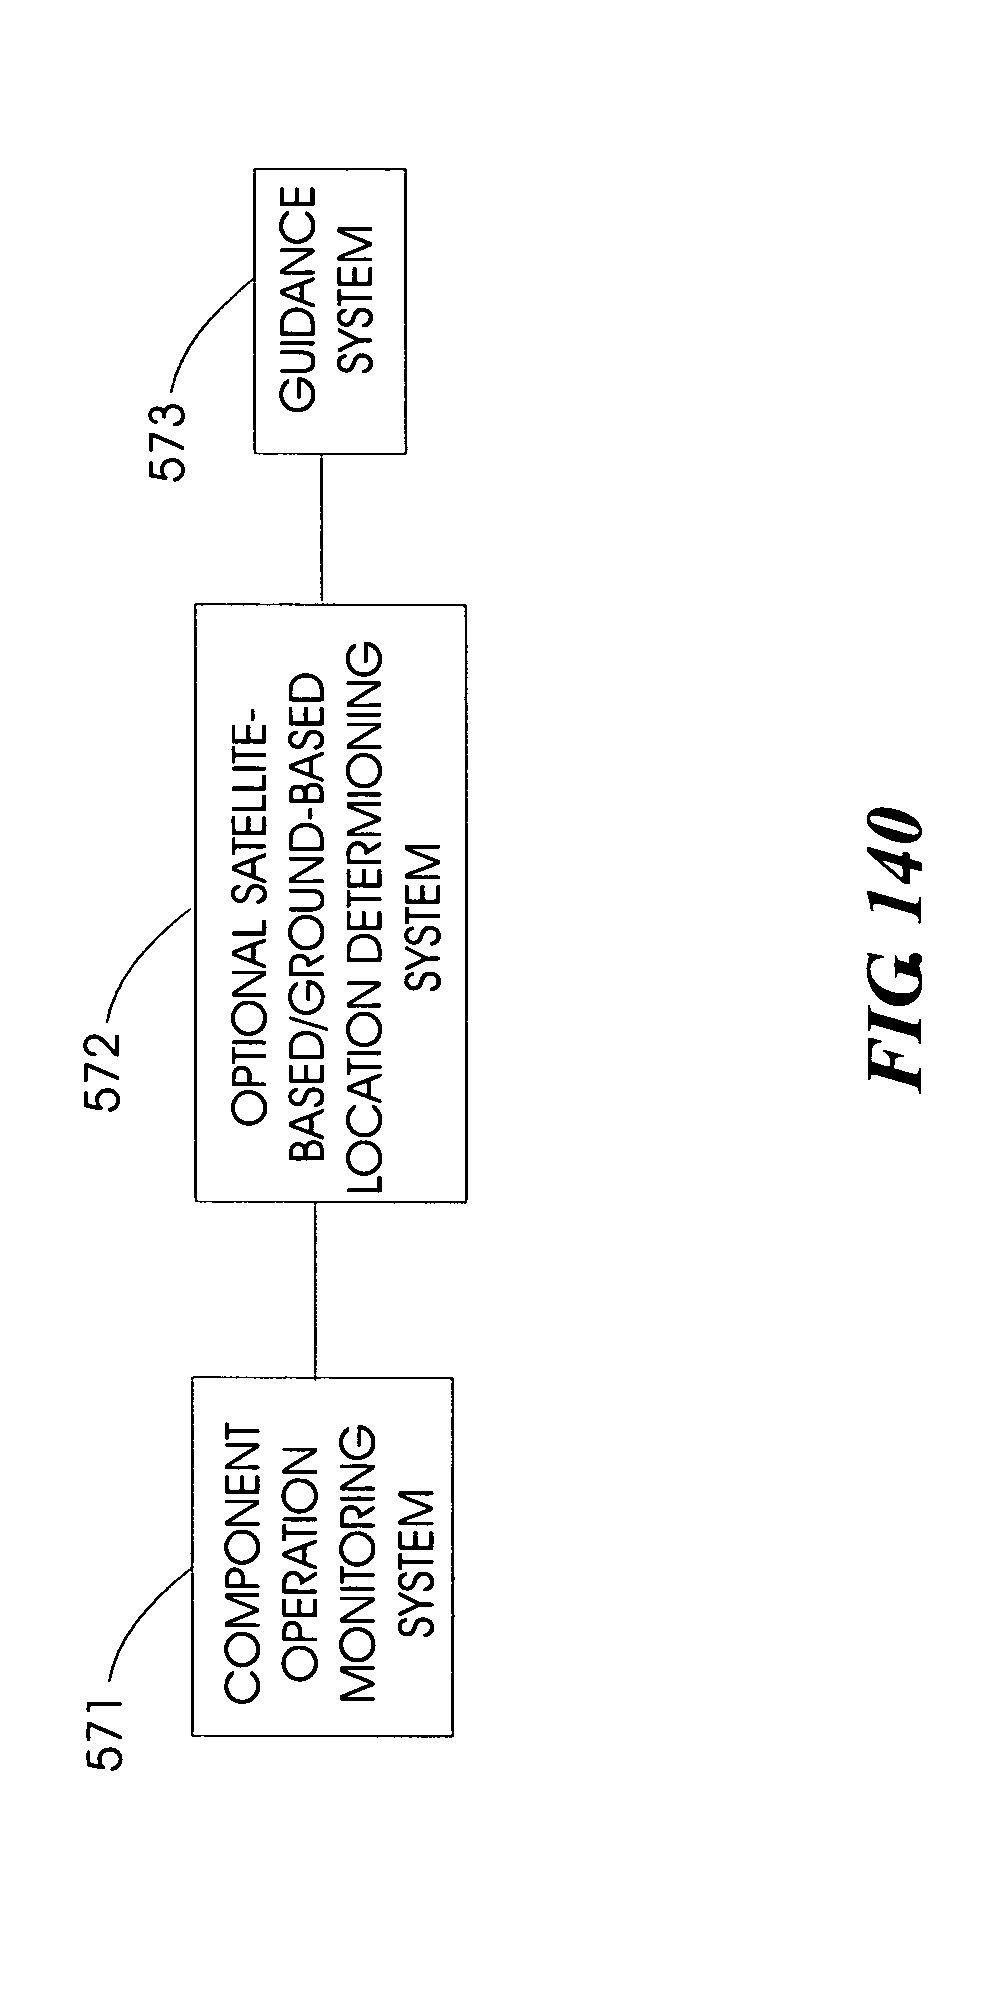 Patent Us 7164117 B2 Breathing Led Circuit Diagram Images